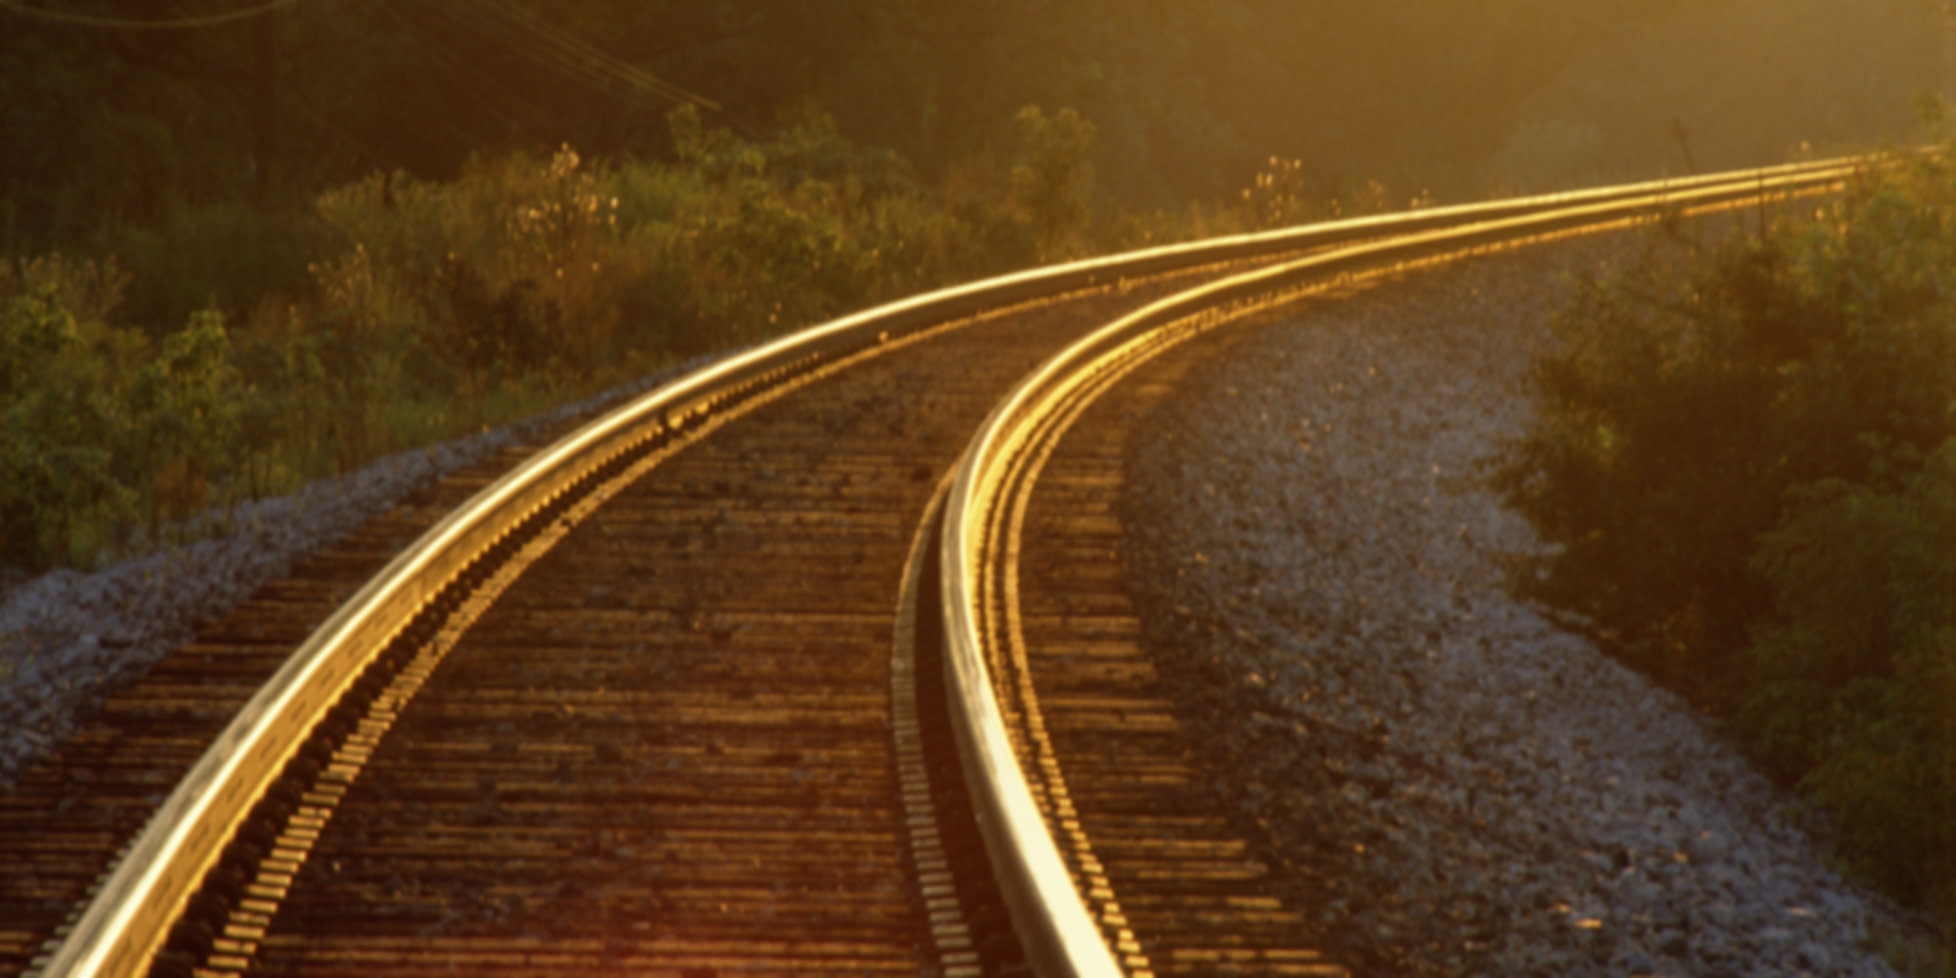 o-TRAIN-TRACKS-facebook.jpg